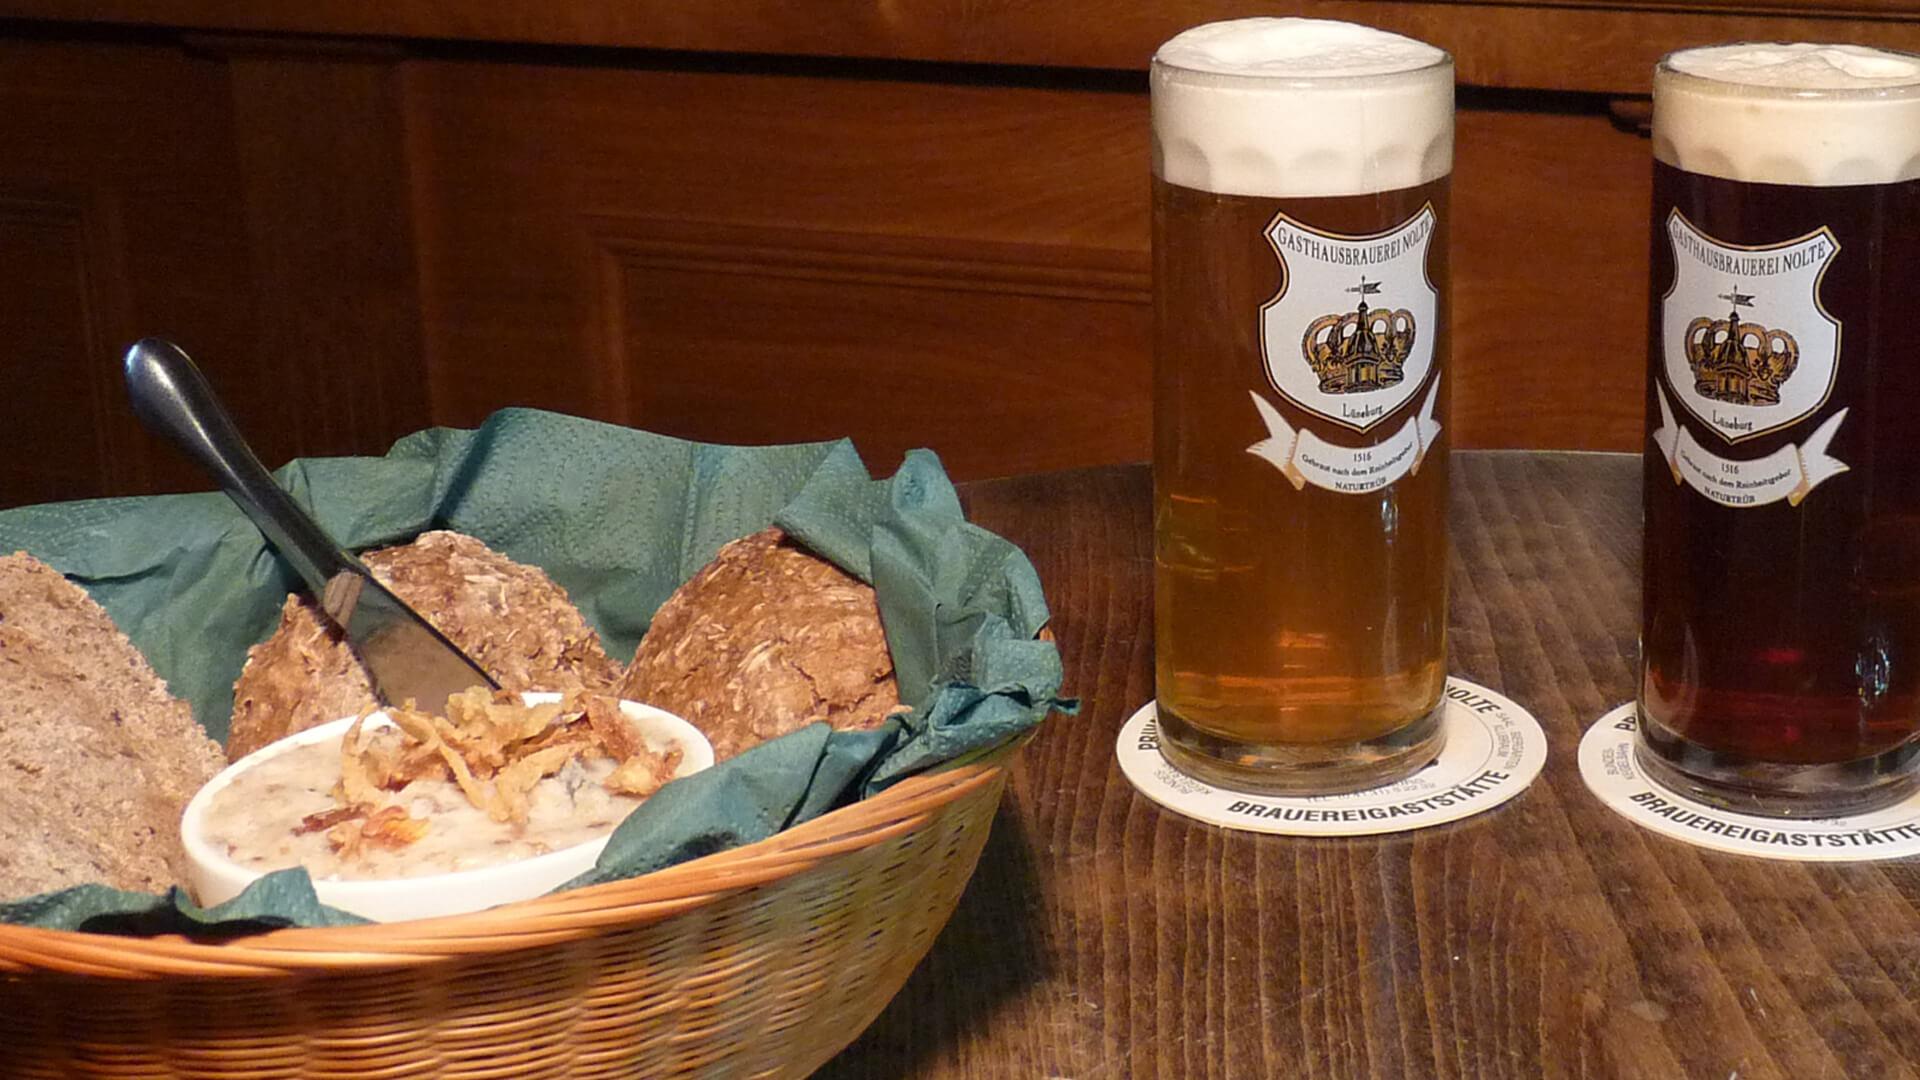 Brauhaus Nolte Lüneburg Bier